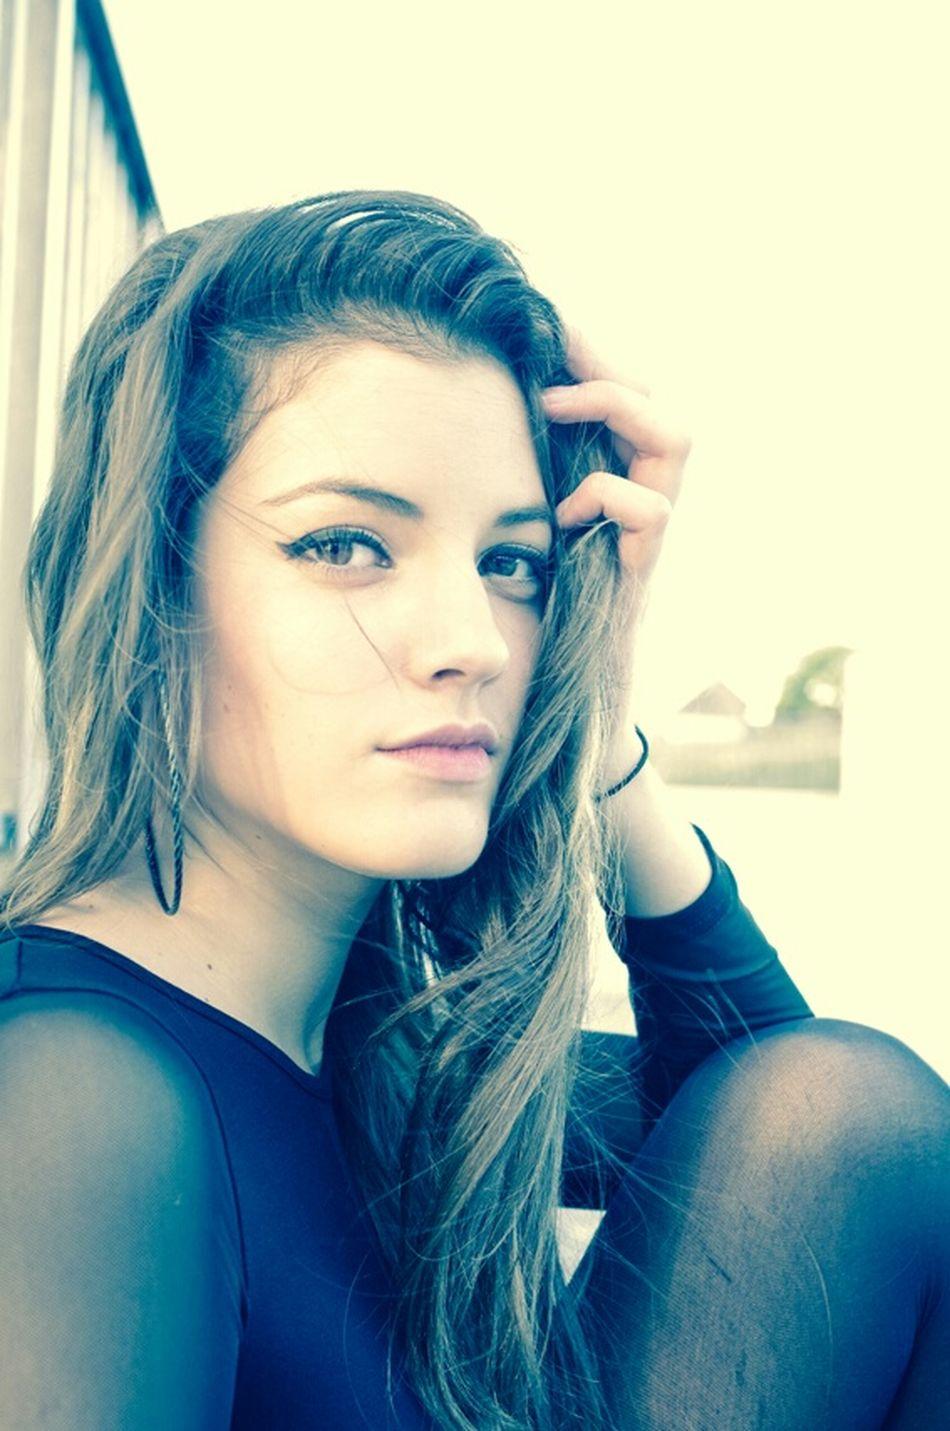 Girl Brunette Straightface Eyes Photoshoot Happiness Sunny Model